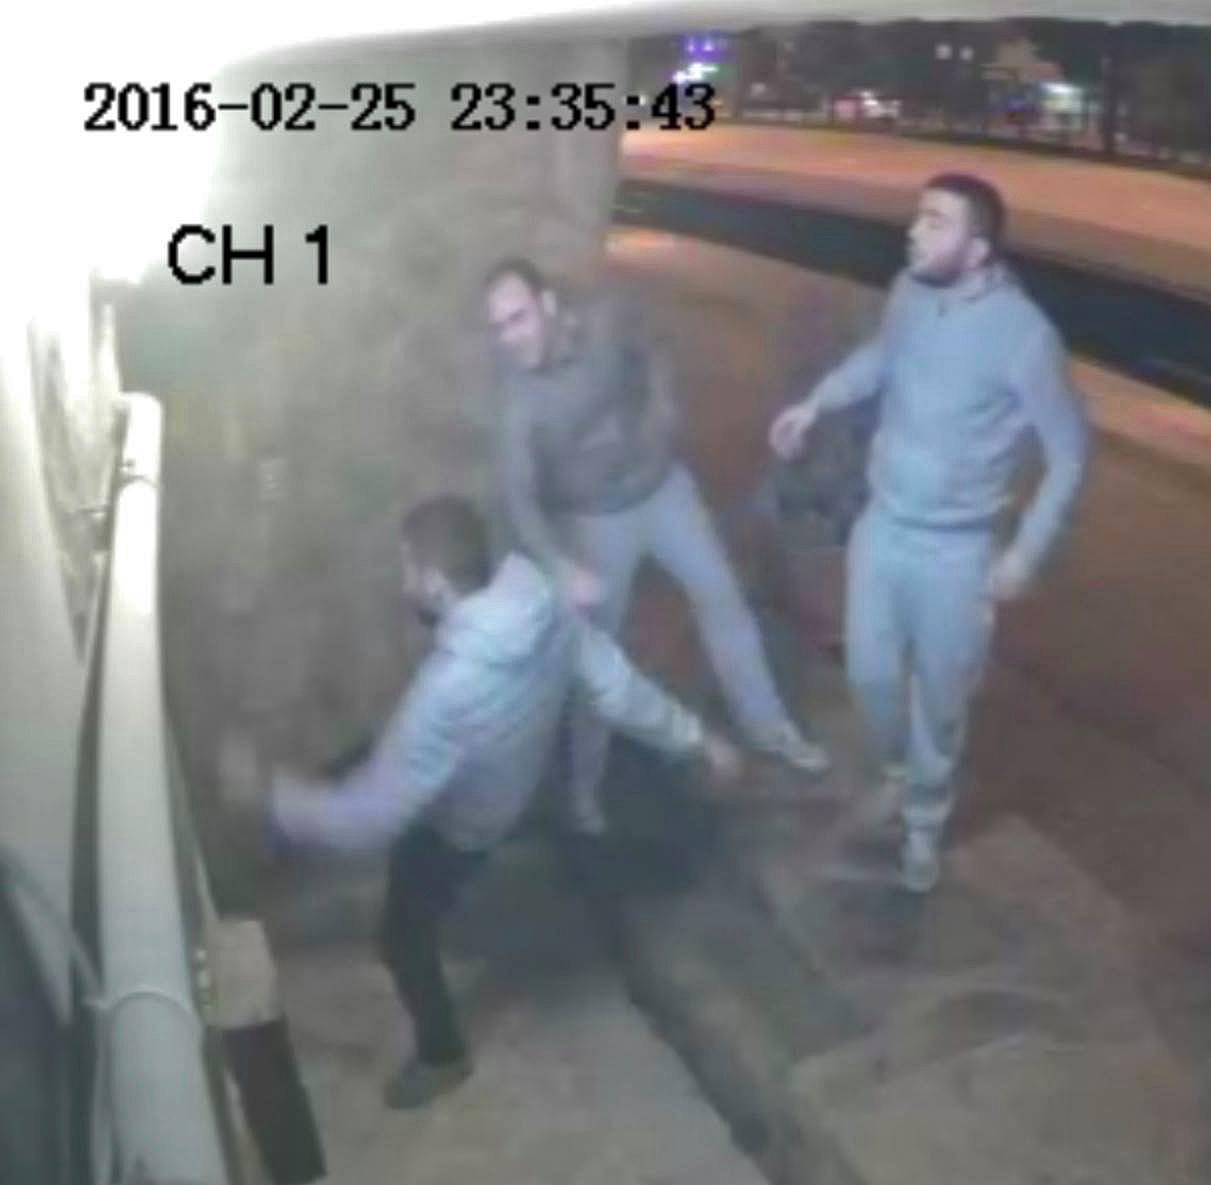 Security camera recorded attack on church building in Samsun, Turkey. (Morning Star News)